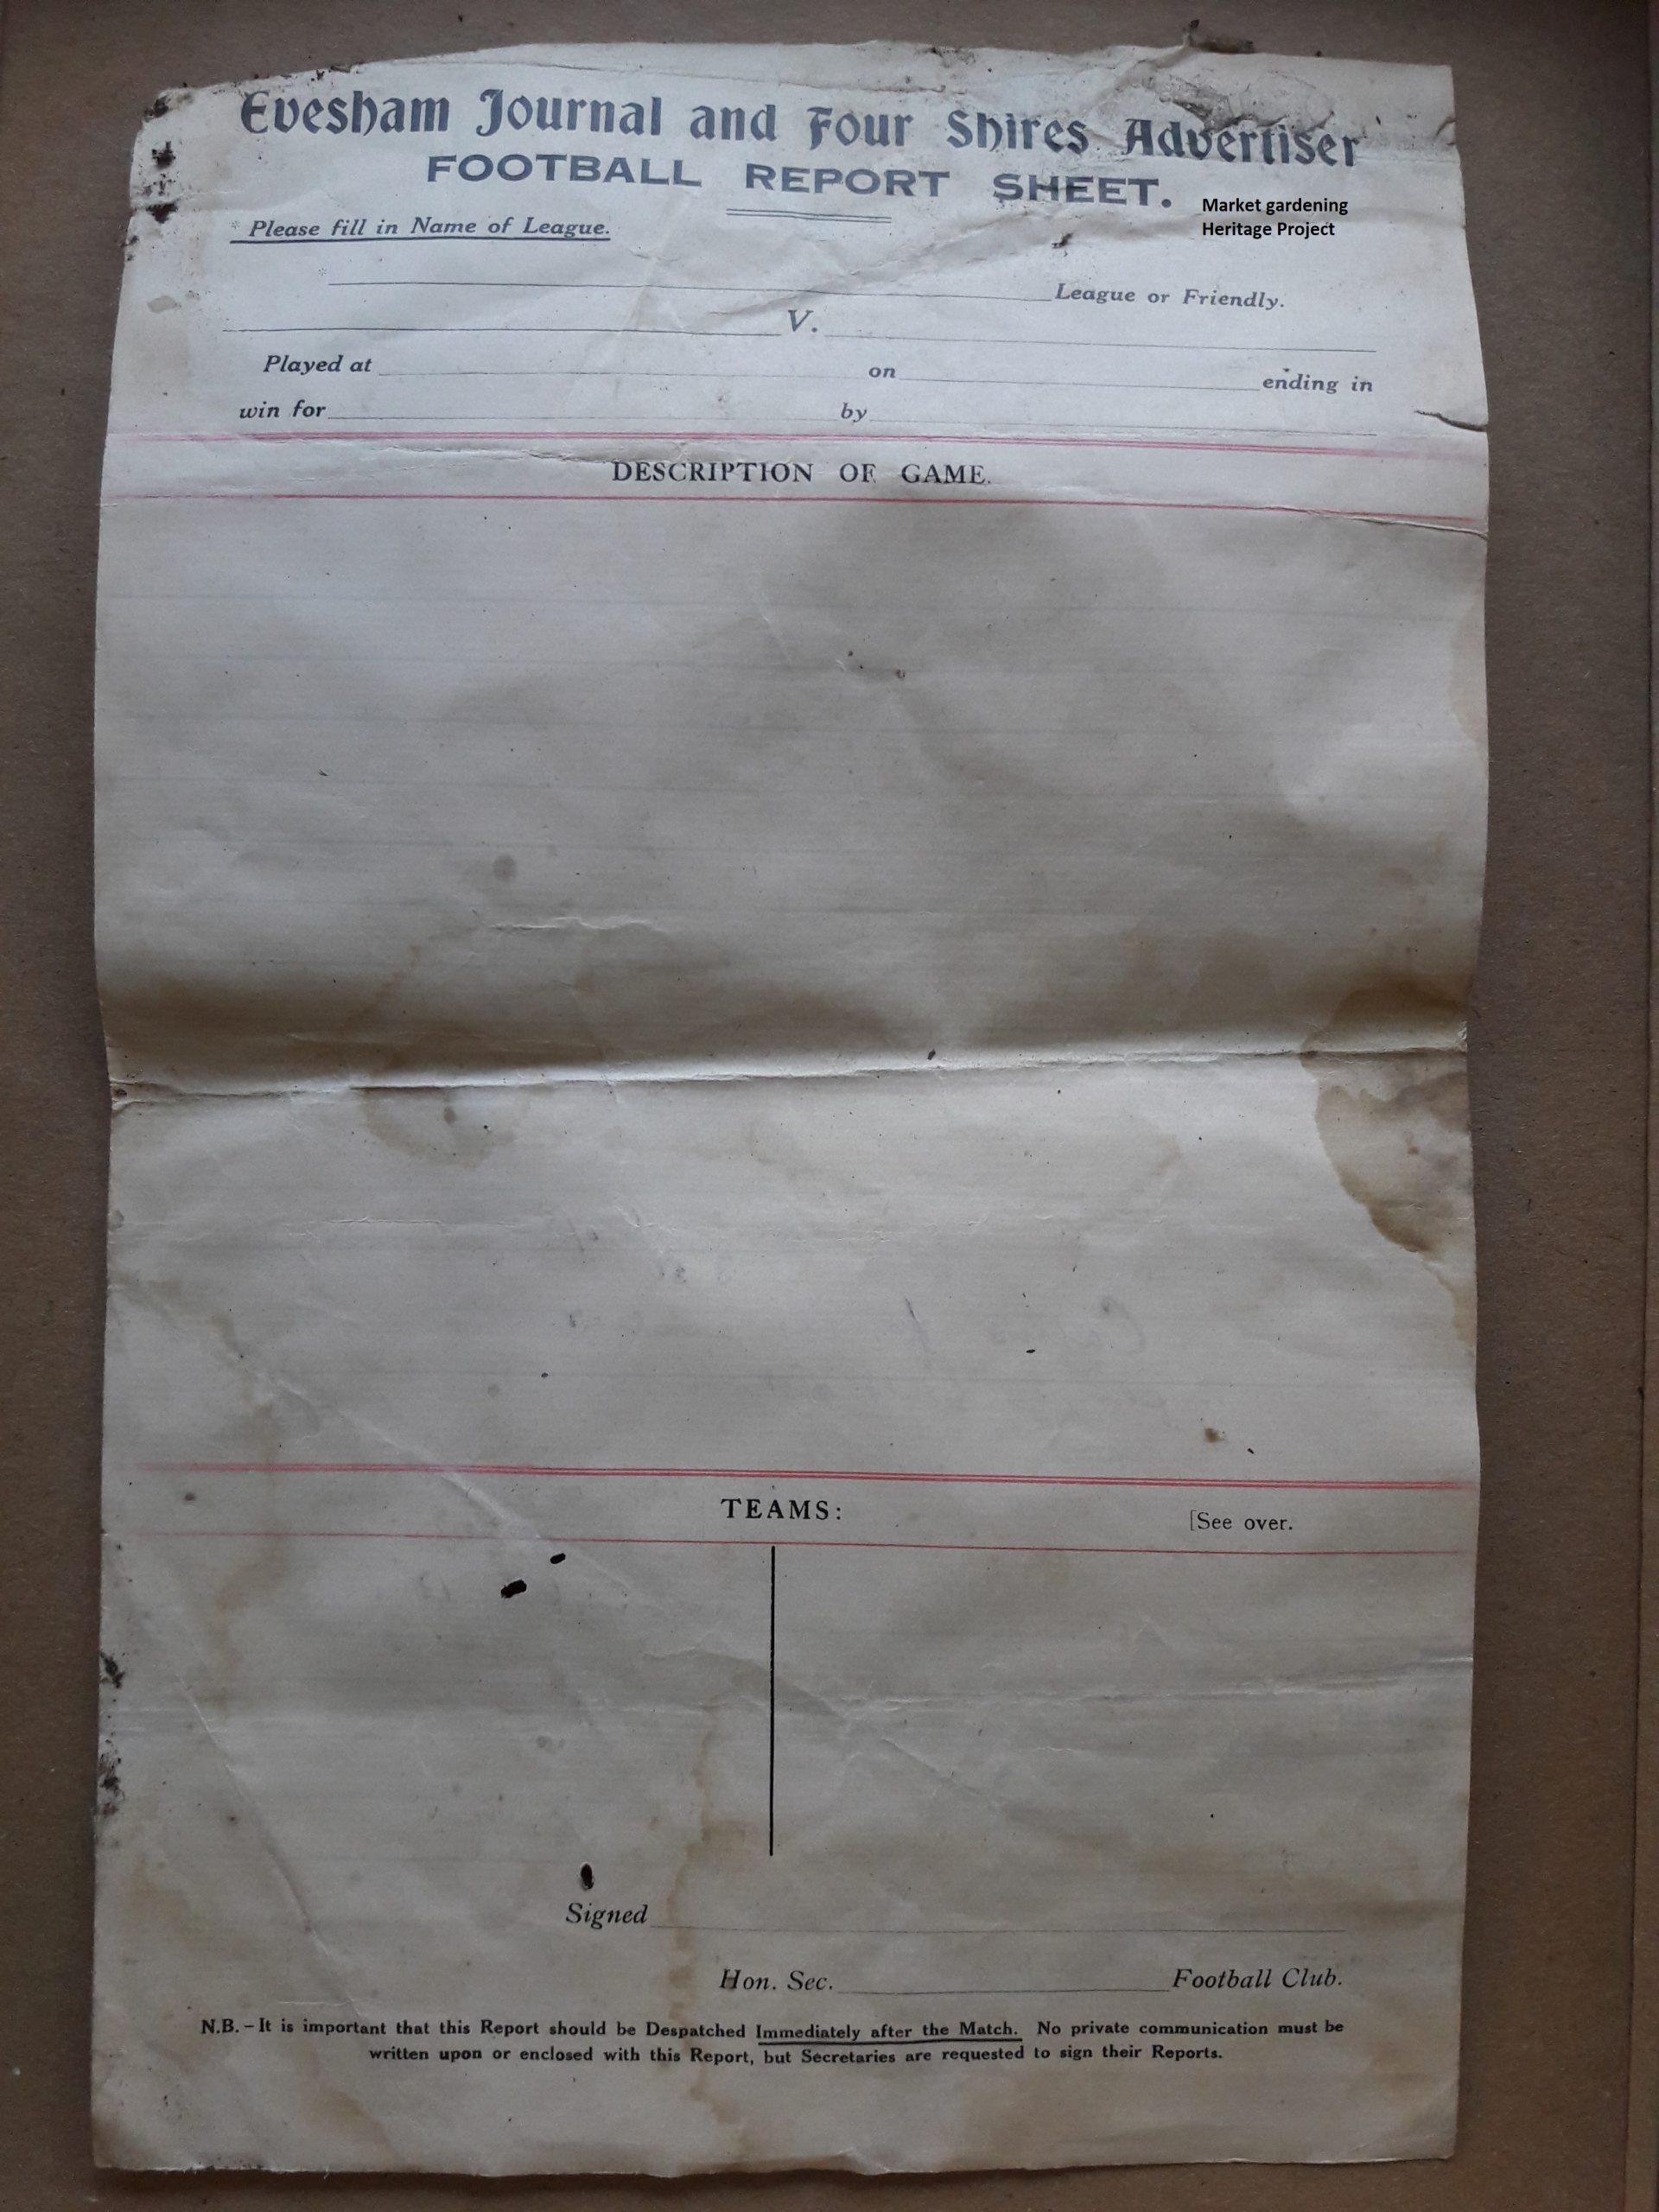 football report form